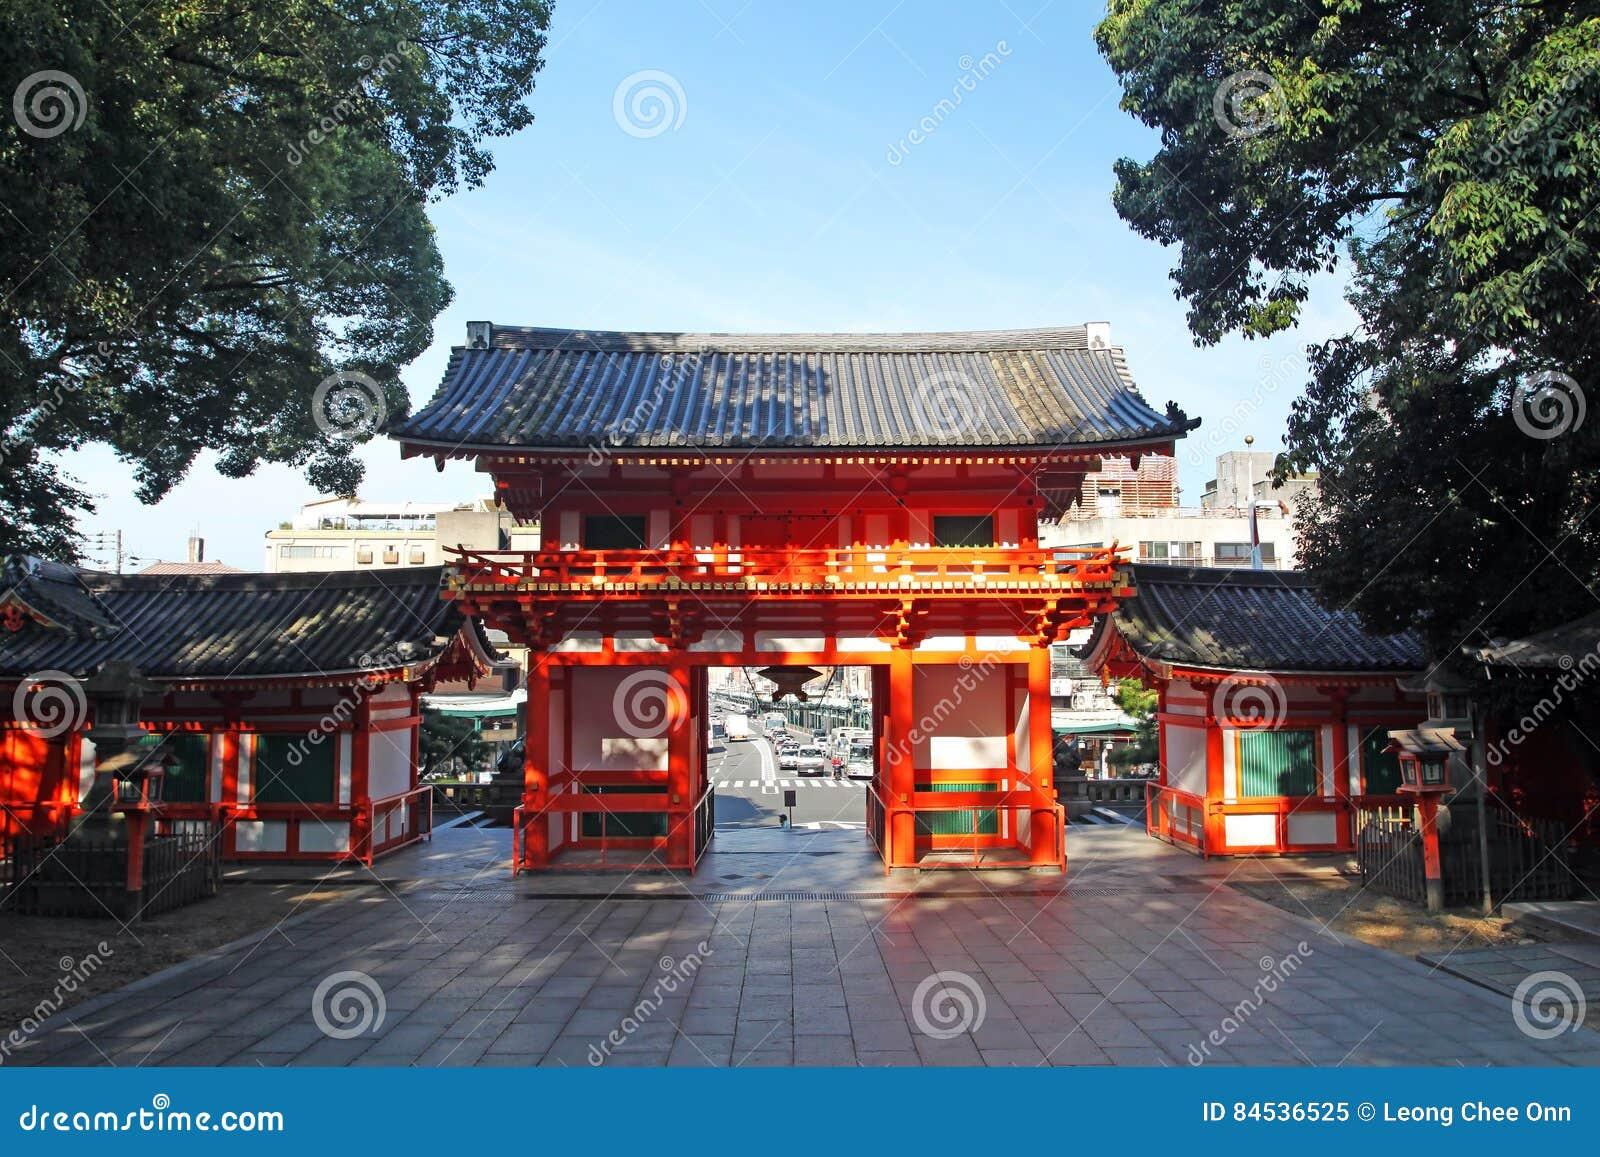 Stock image of Yasaka Shrine, Gion District, Kyoto, Japan